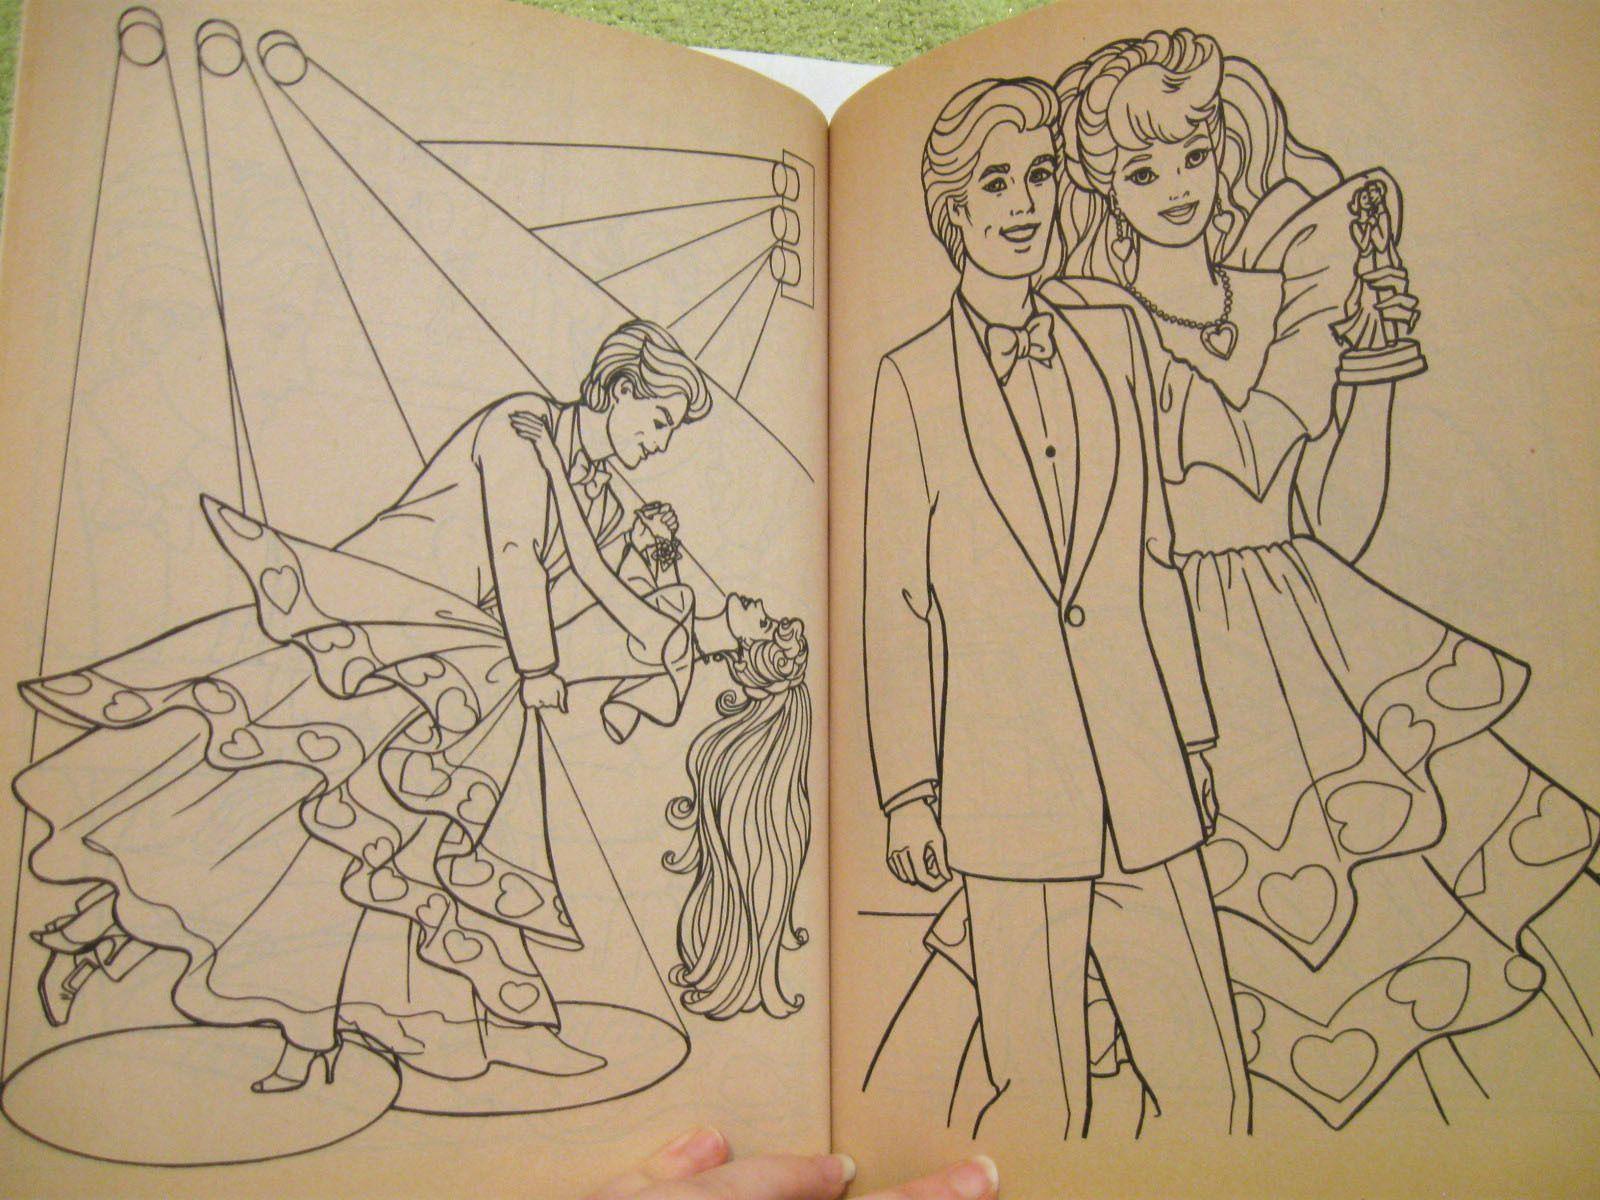 Holiday barbie coloring book vintage 1996 uncolored hallmark christmas beach ken • 15 99 picclick